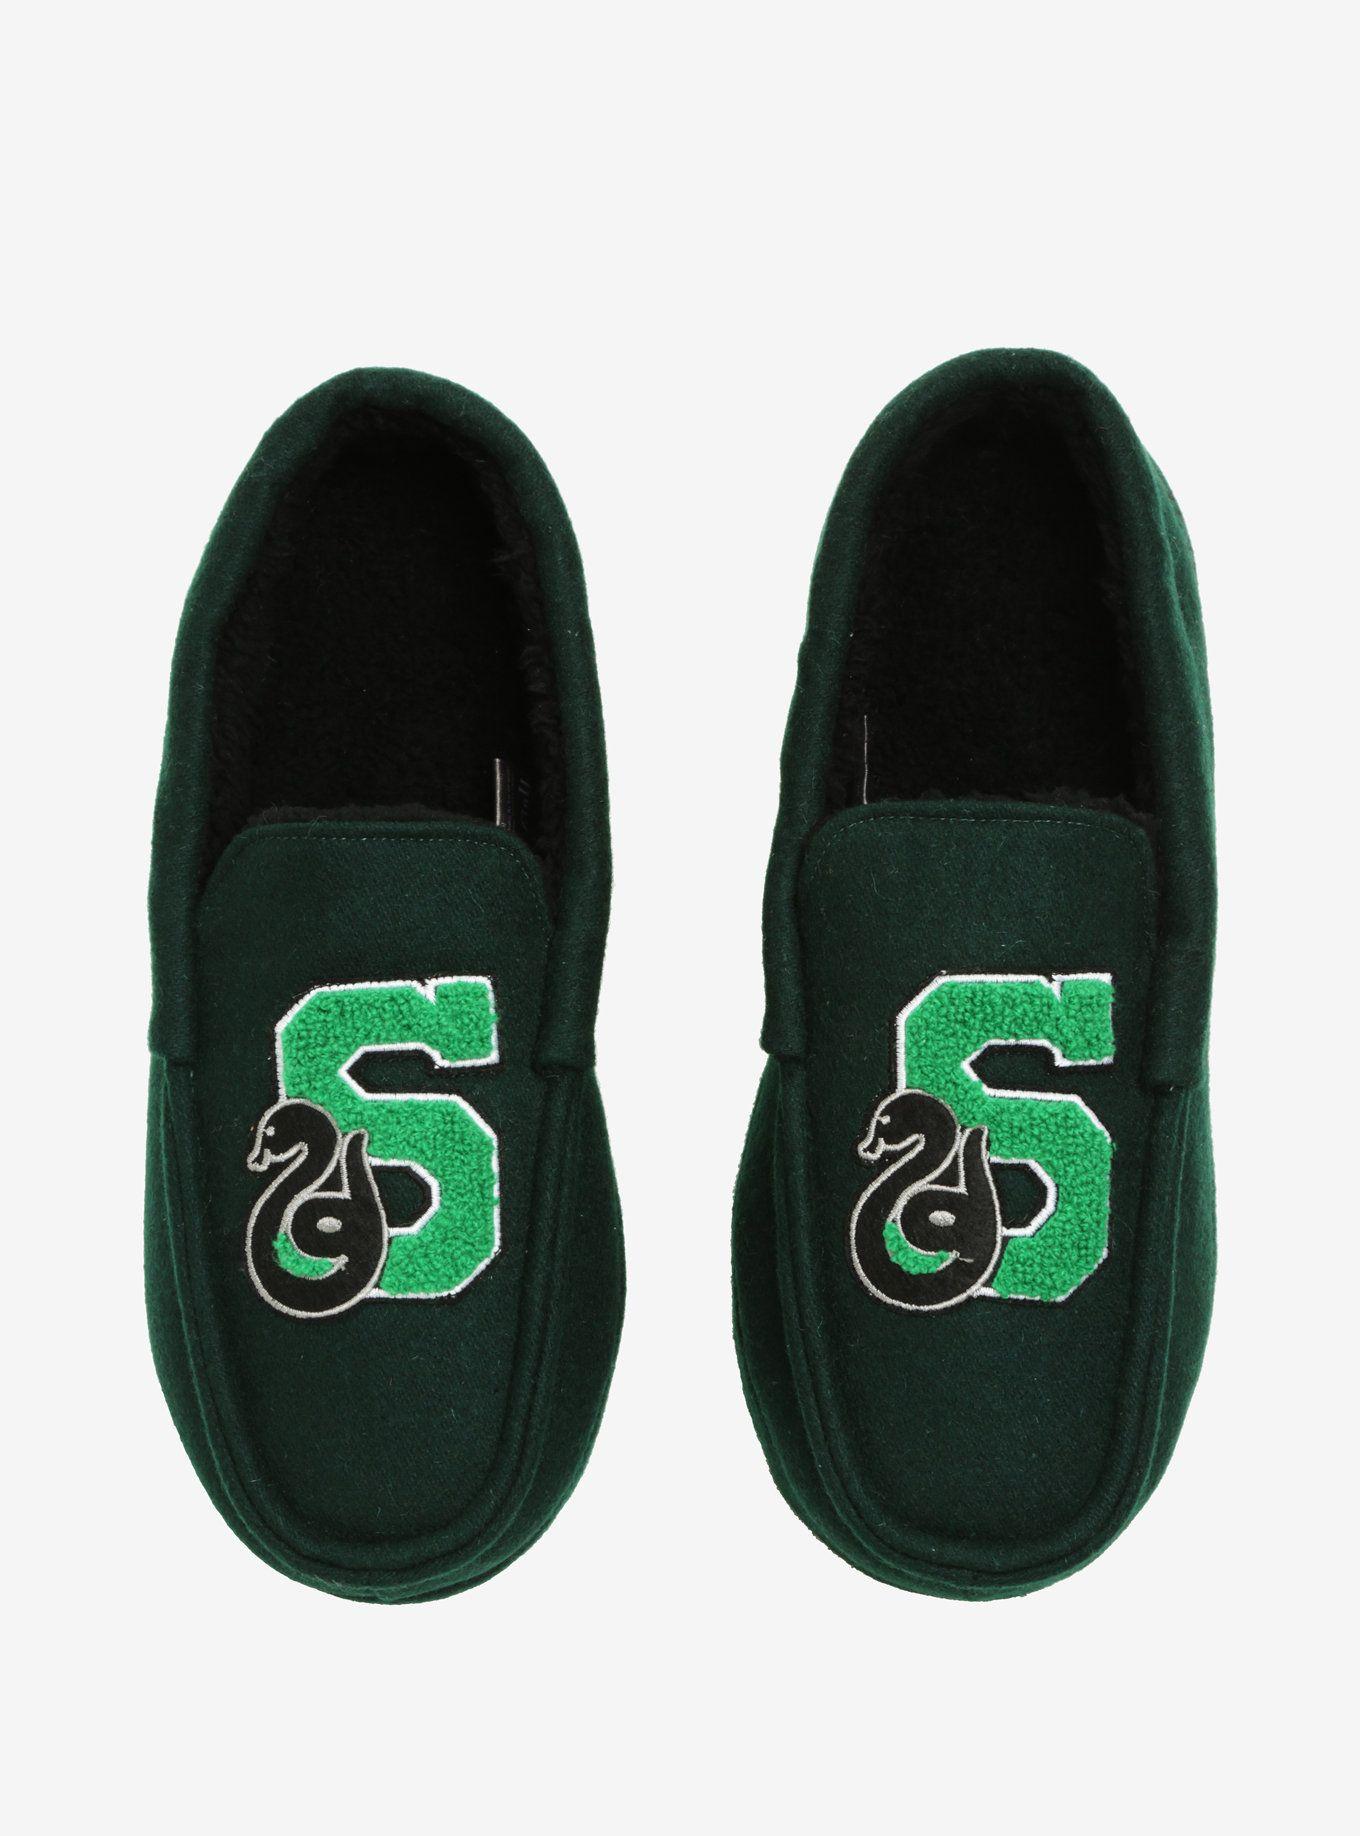 55e8ba13a34bf Harry Potter Slytherin Moccasin Slippers in 2019 | Slytherin Pride ...